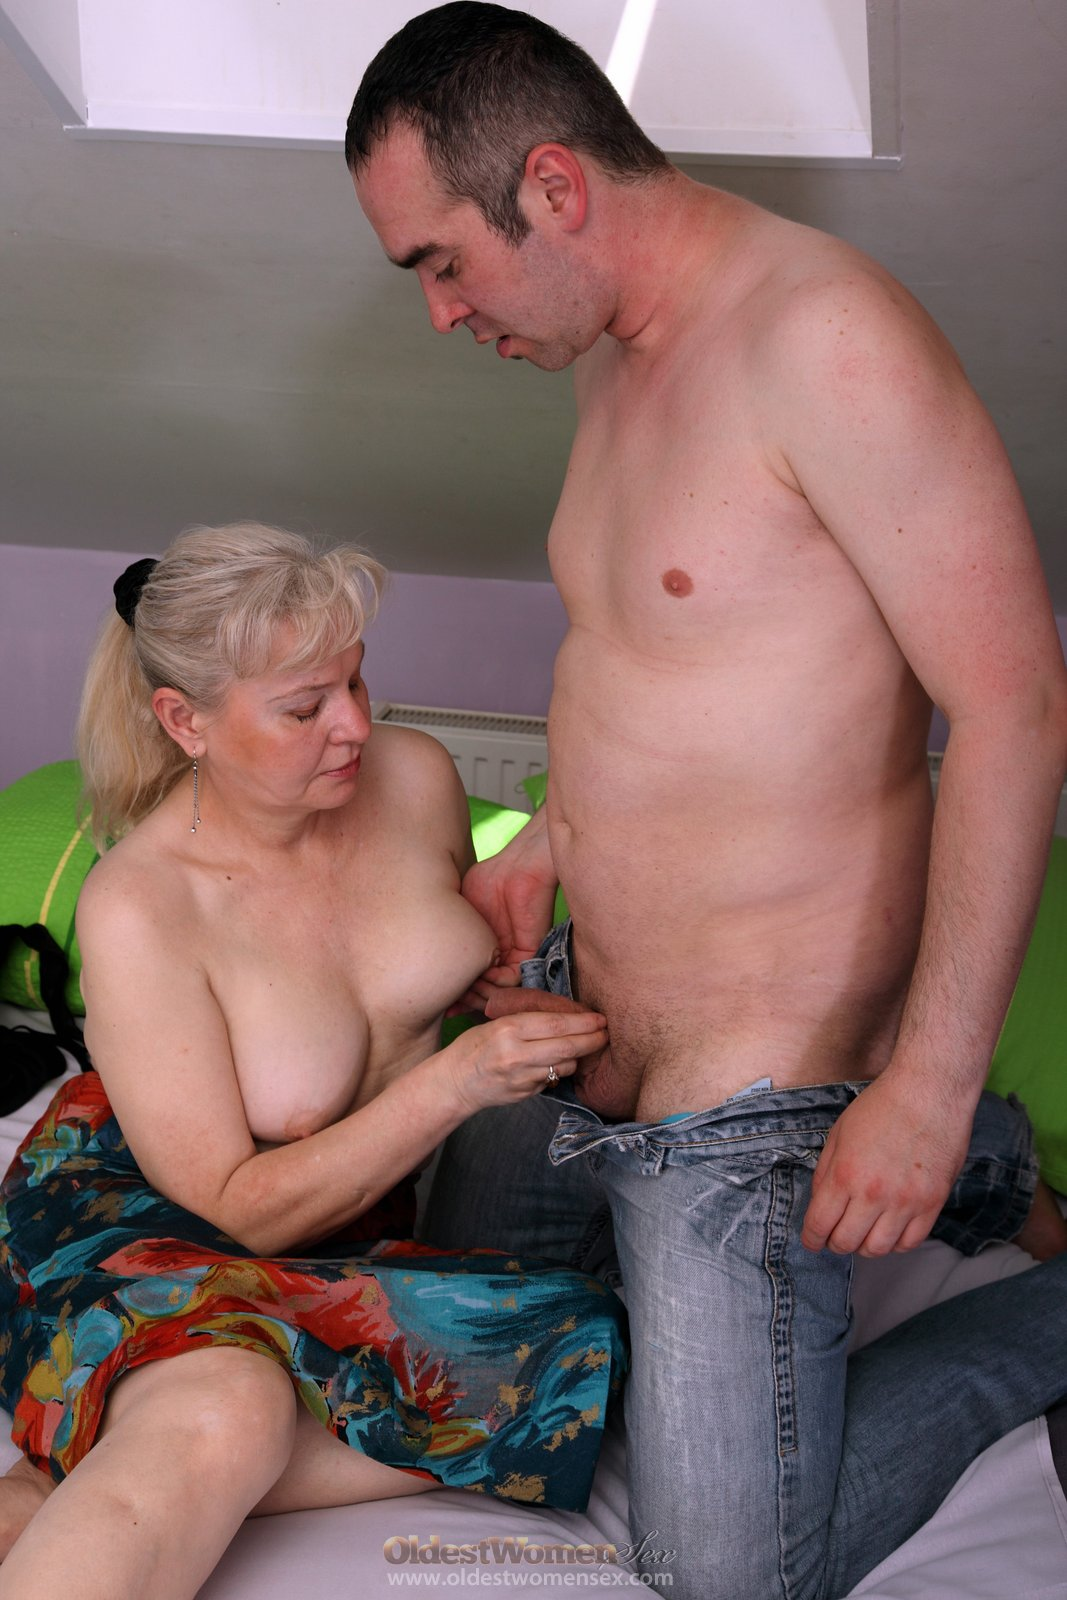 Секс стары сильно старых бабушек 23 фотография